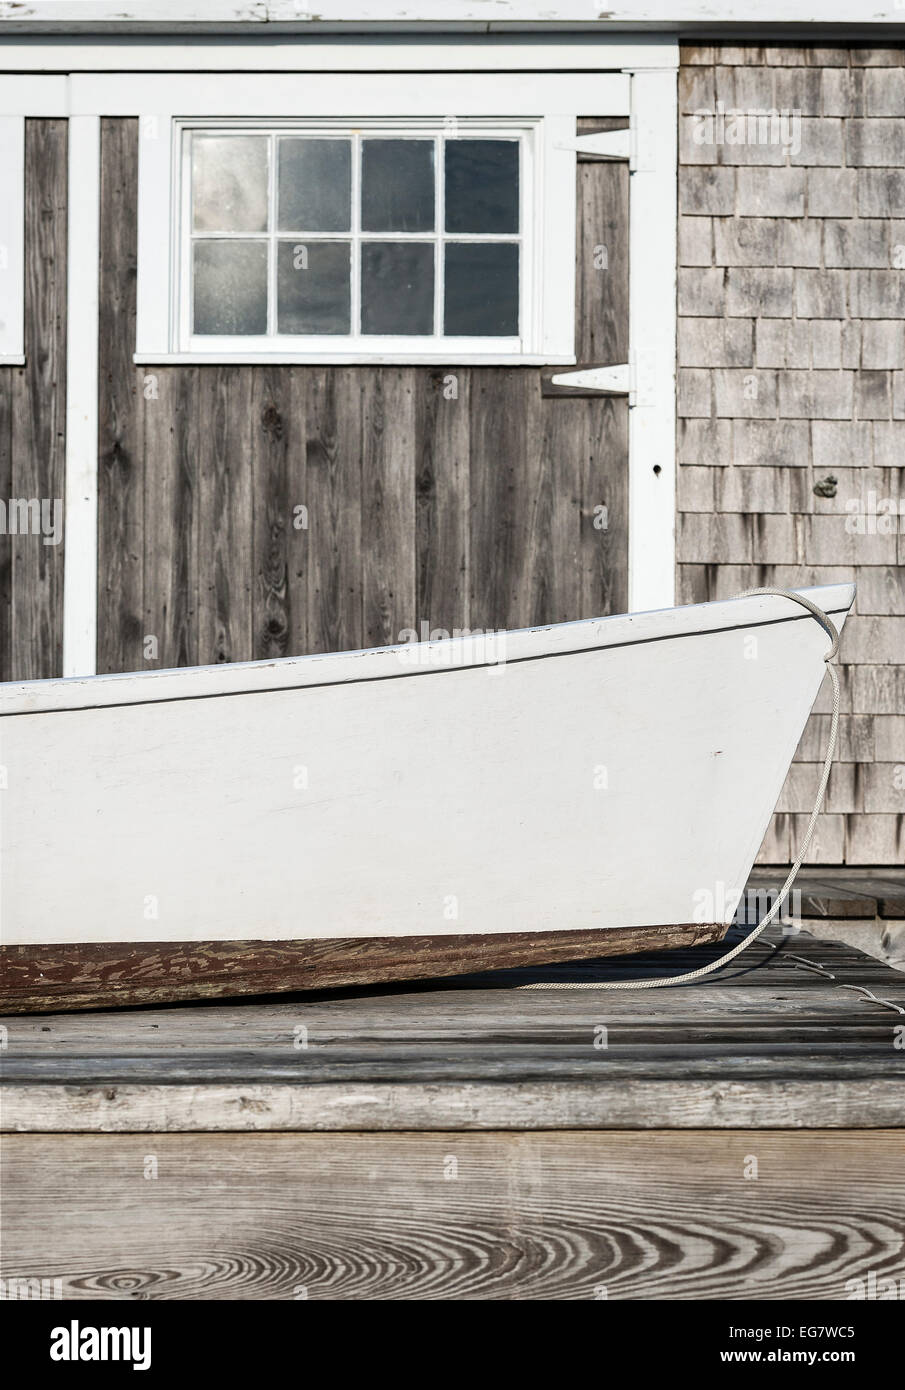 Rowboat and boathouse detail, Cape Cod, Massachusetts, USA - Stock Image